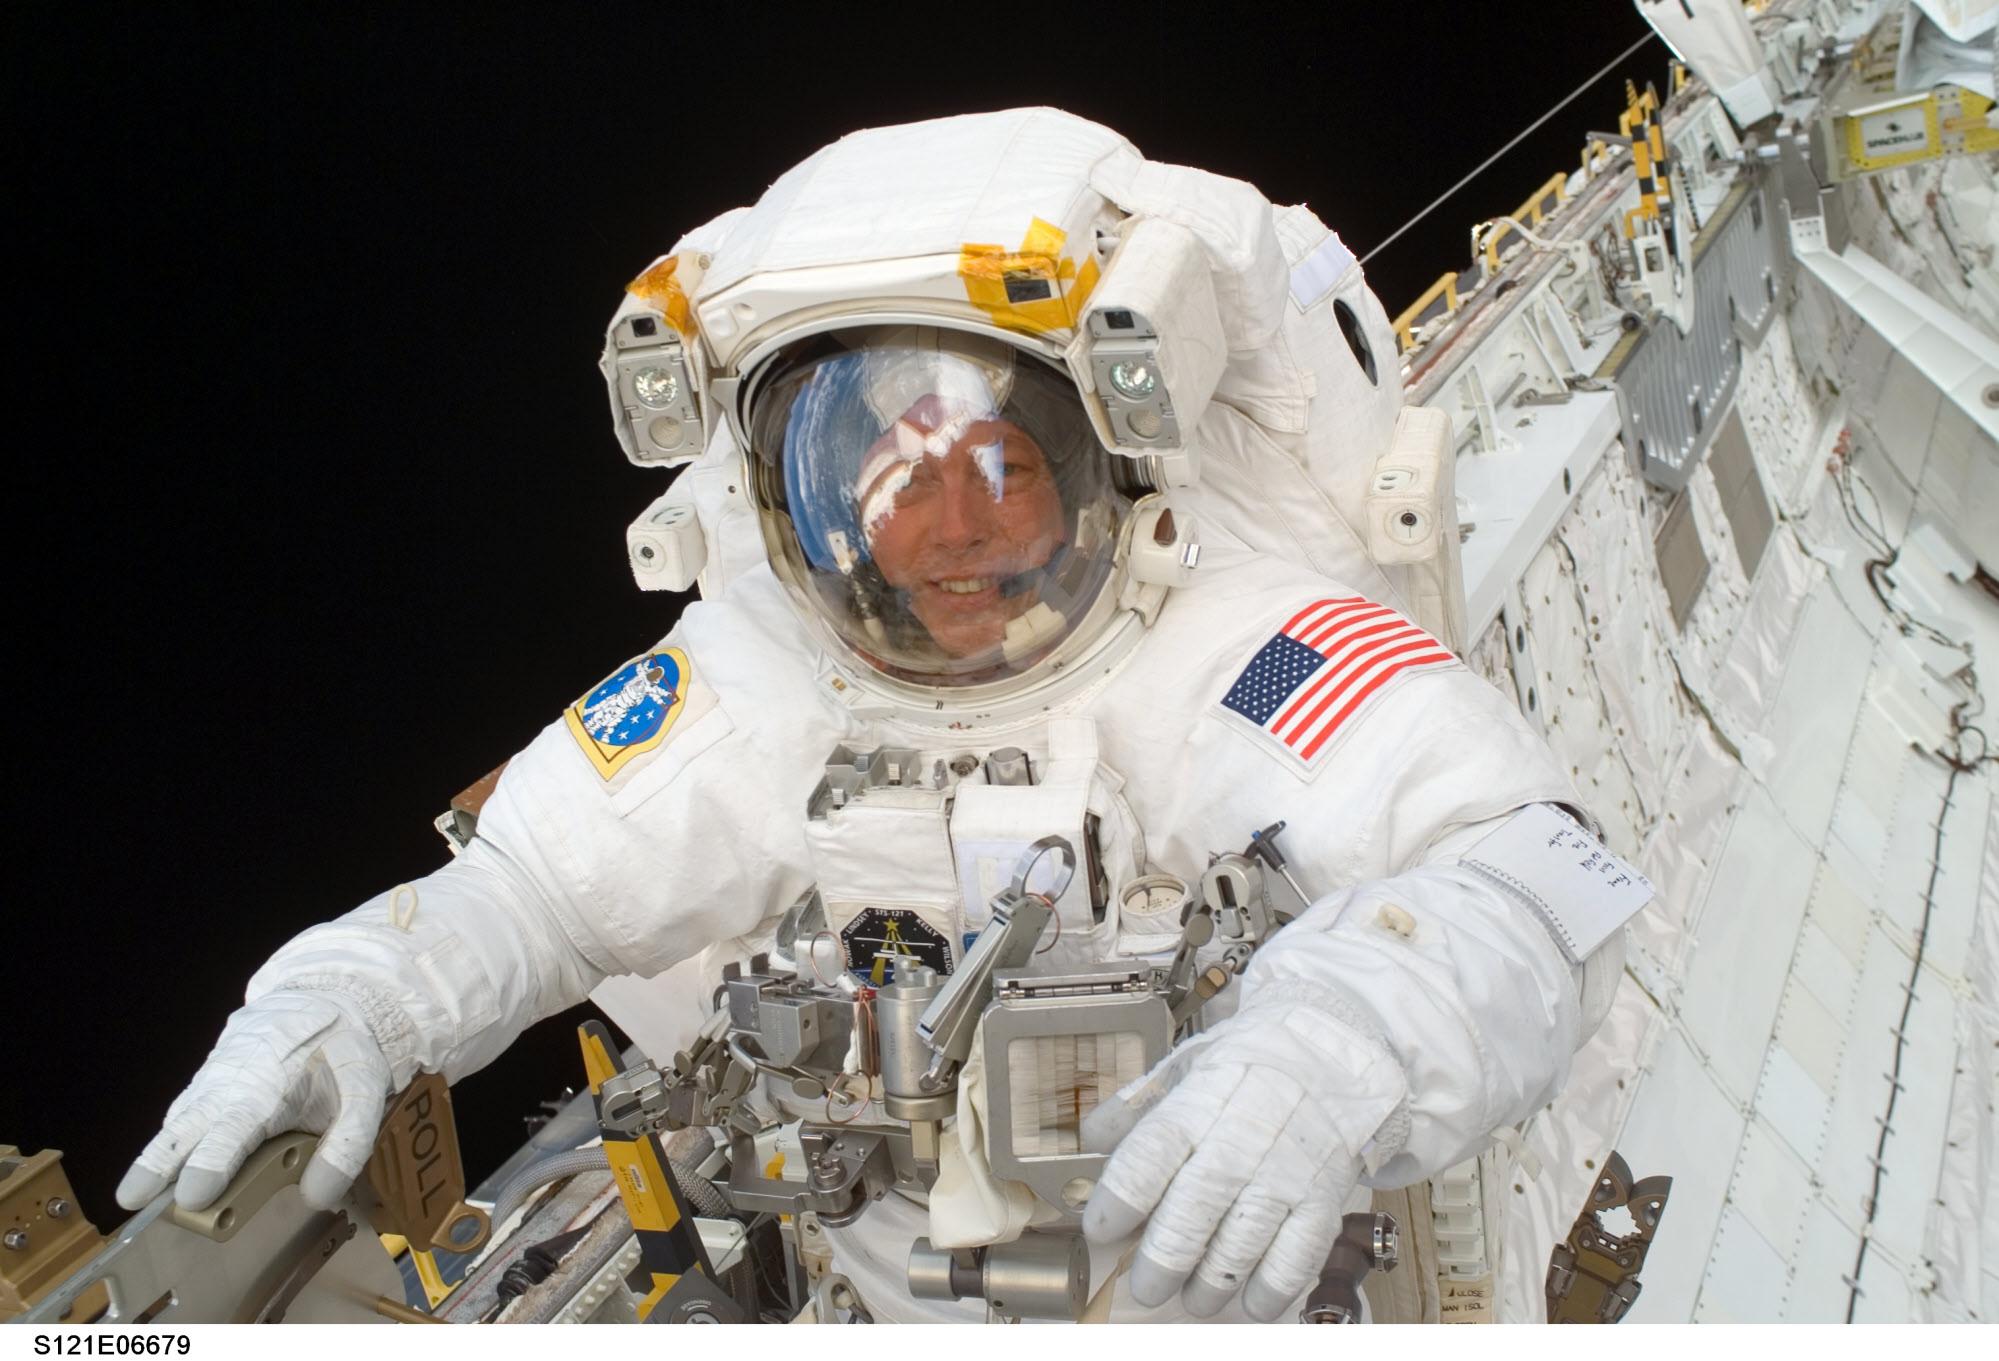 astronaut space suit material - photo #3